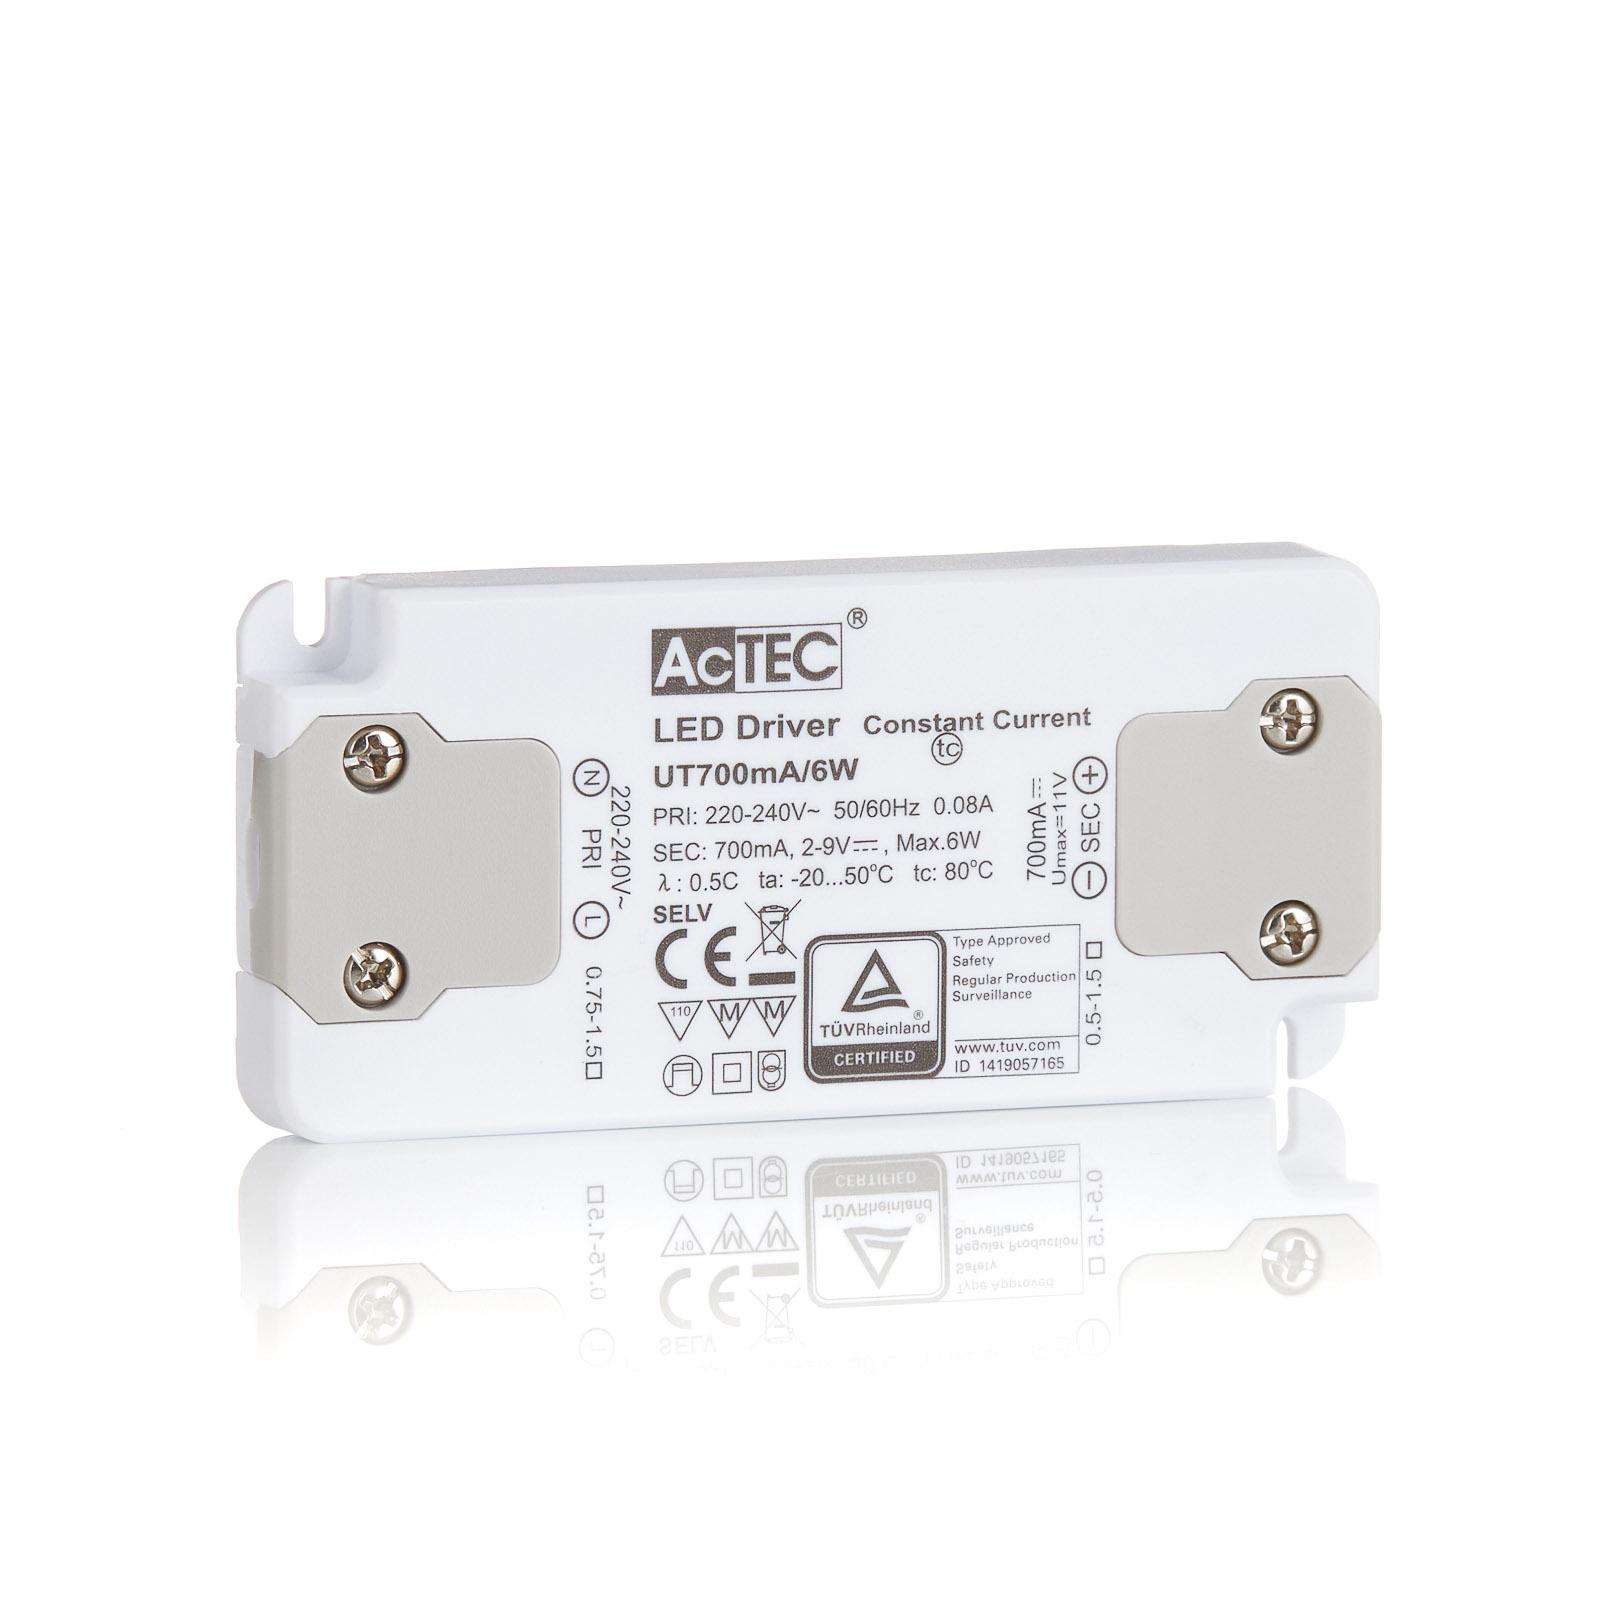 AcTEC Slim driver LED CC 700mA, 6W